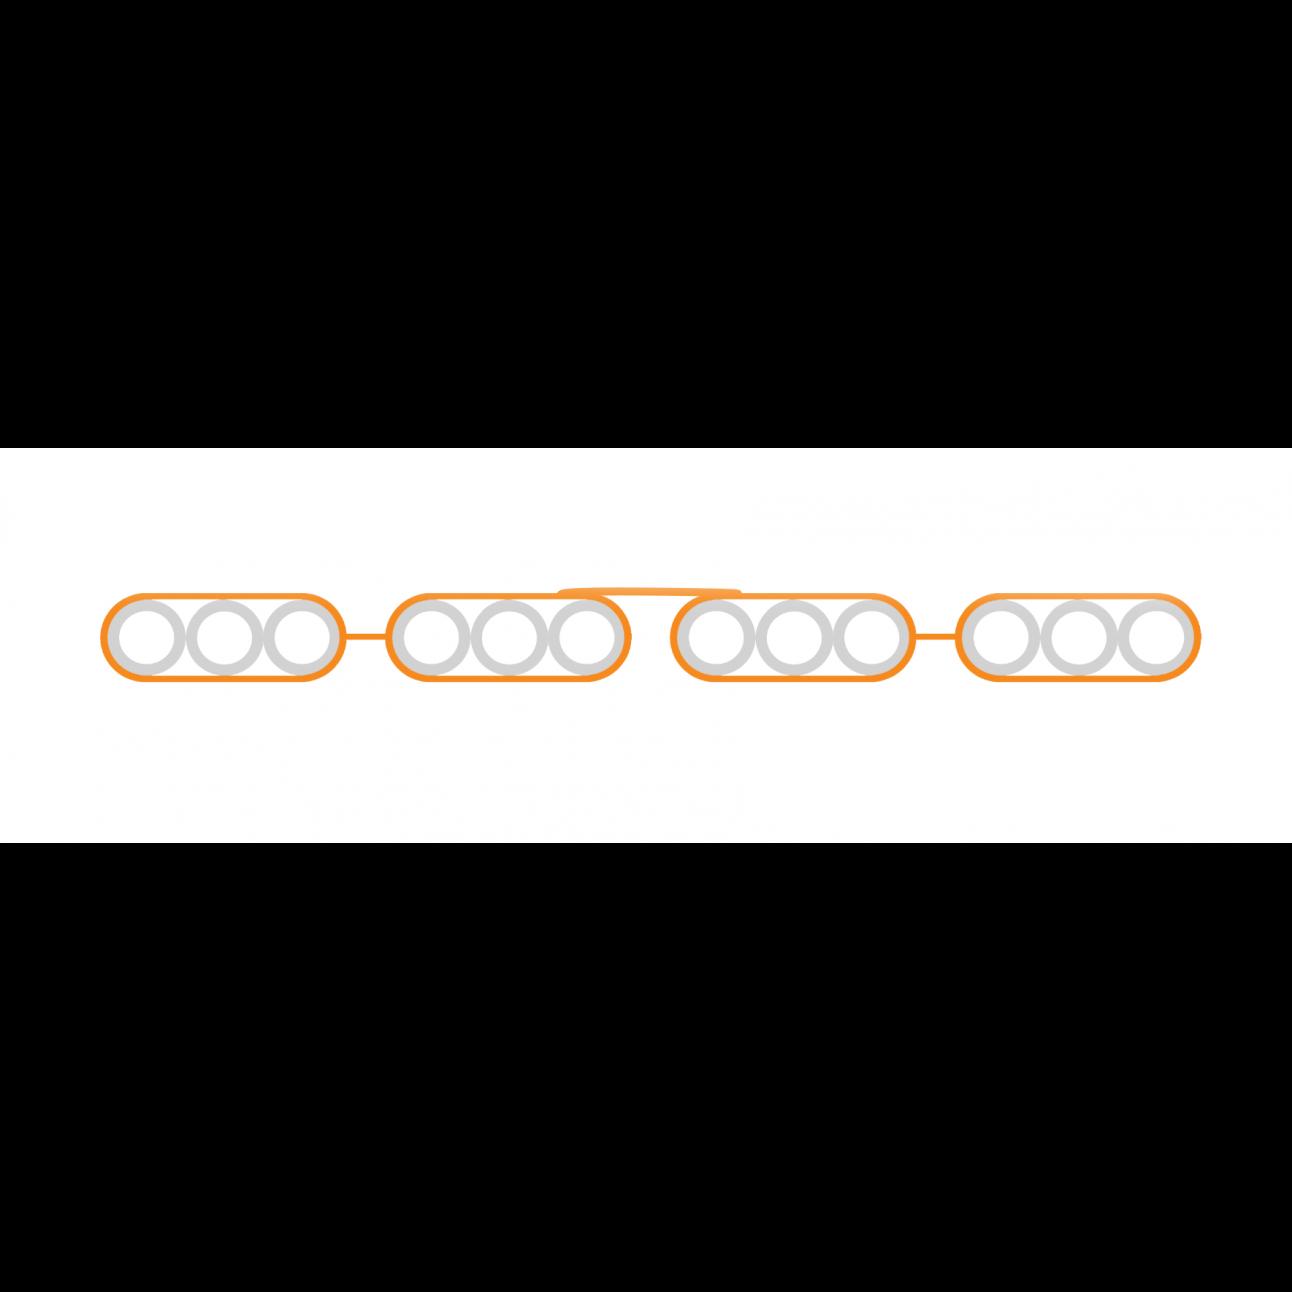 Пакет микротрубок 12х16/12 мм Flatliner (м)